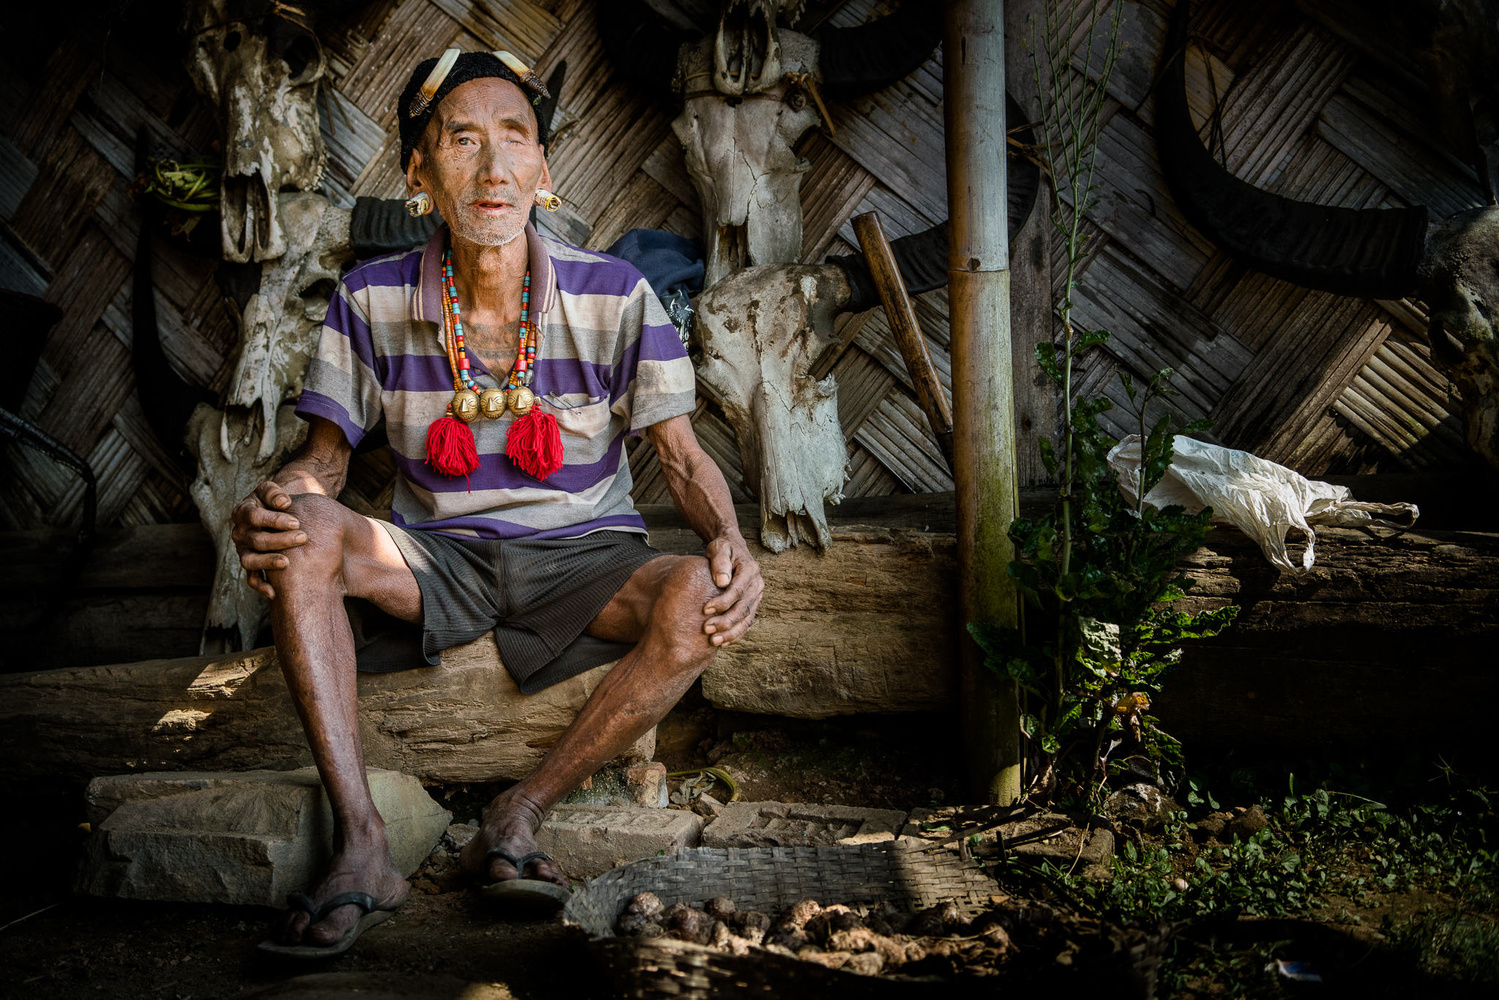 A local man in Nagaland sat down